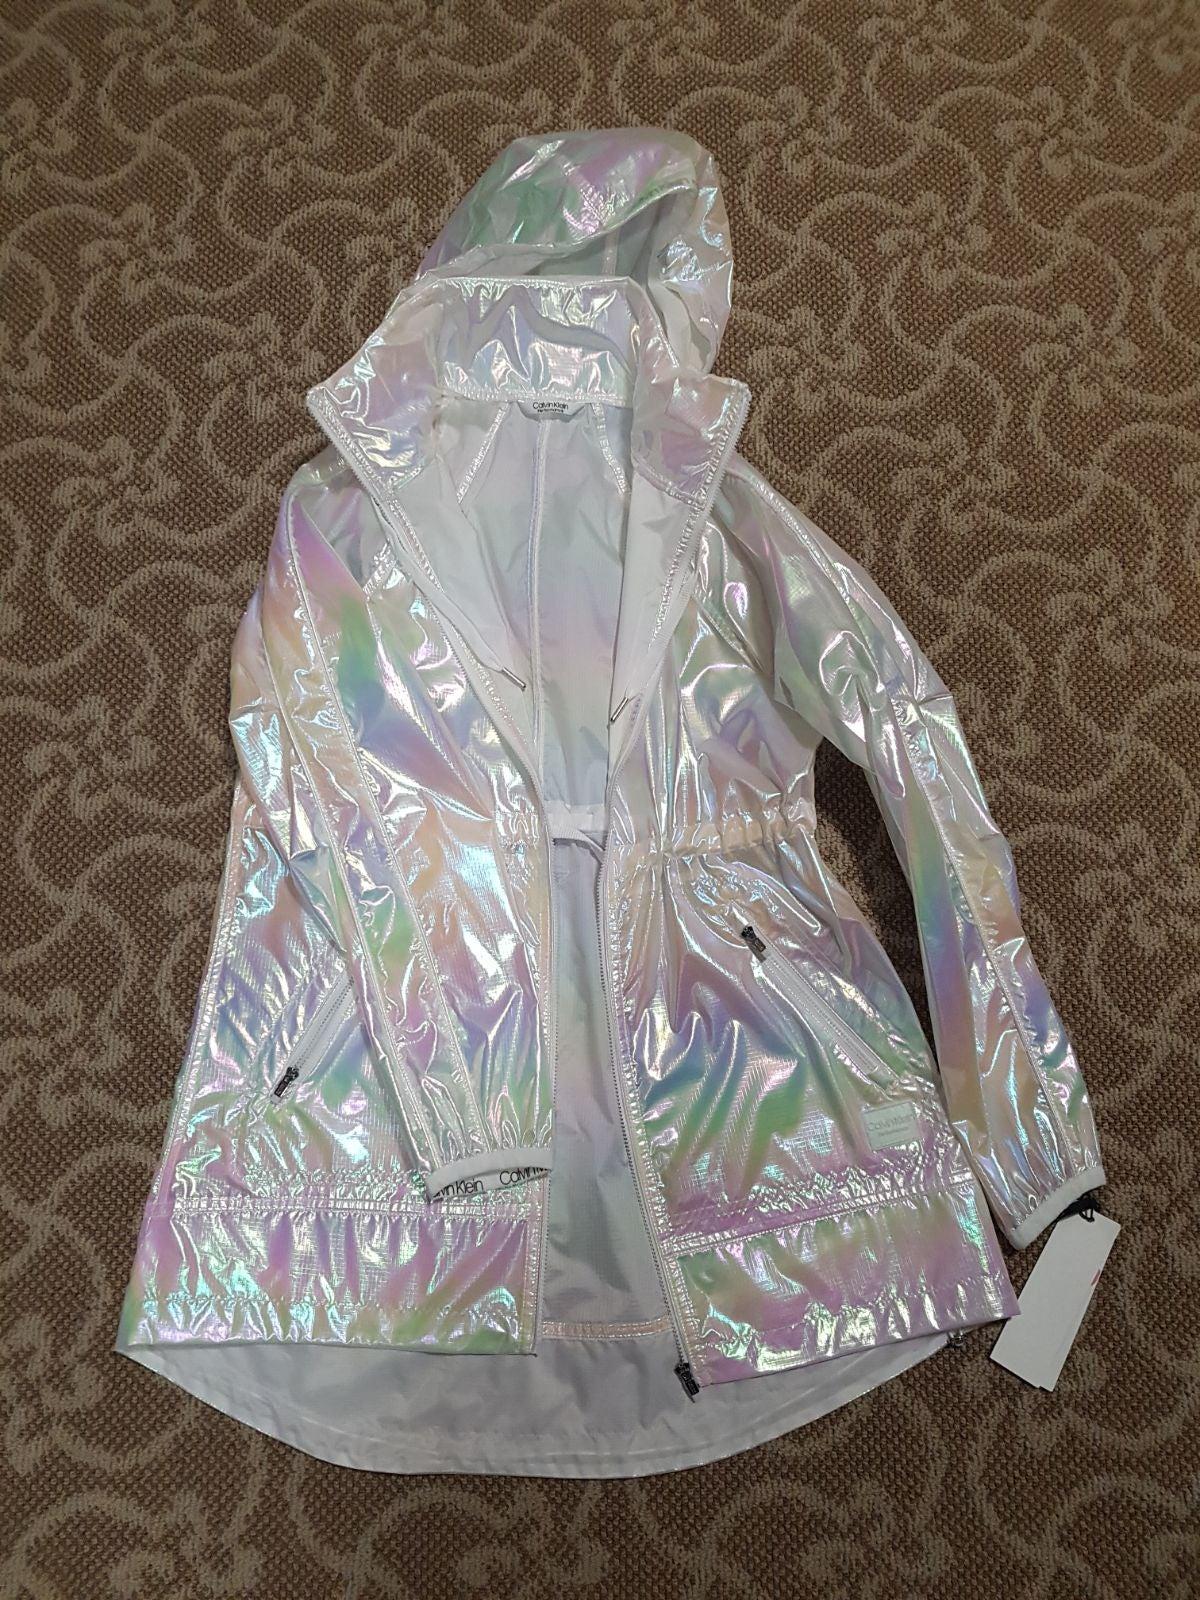 Calvin Klein lightweight raincoats size